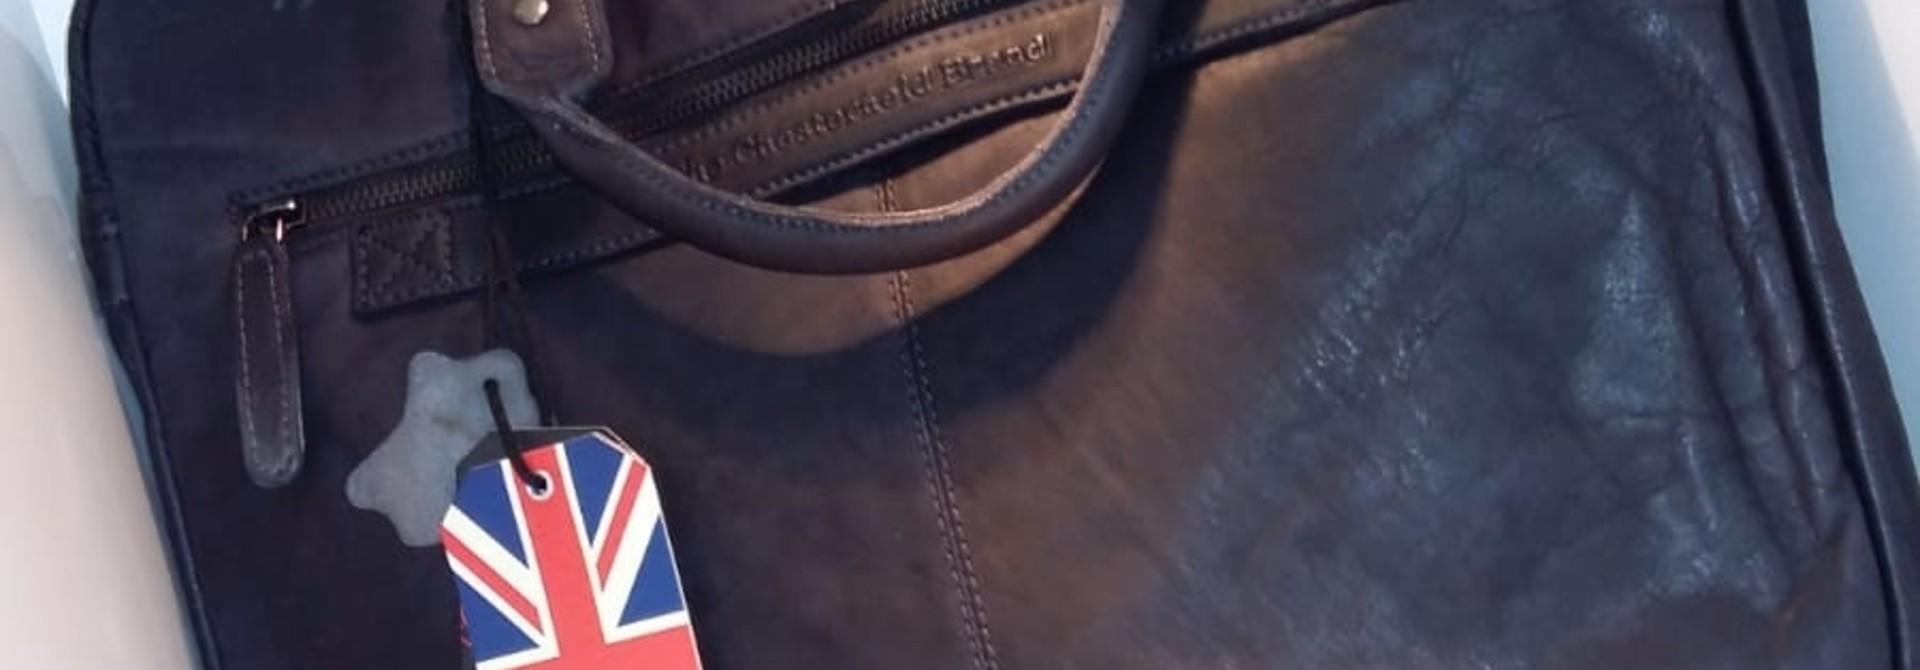 Kadotip: The Chesterfield Brand Bag